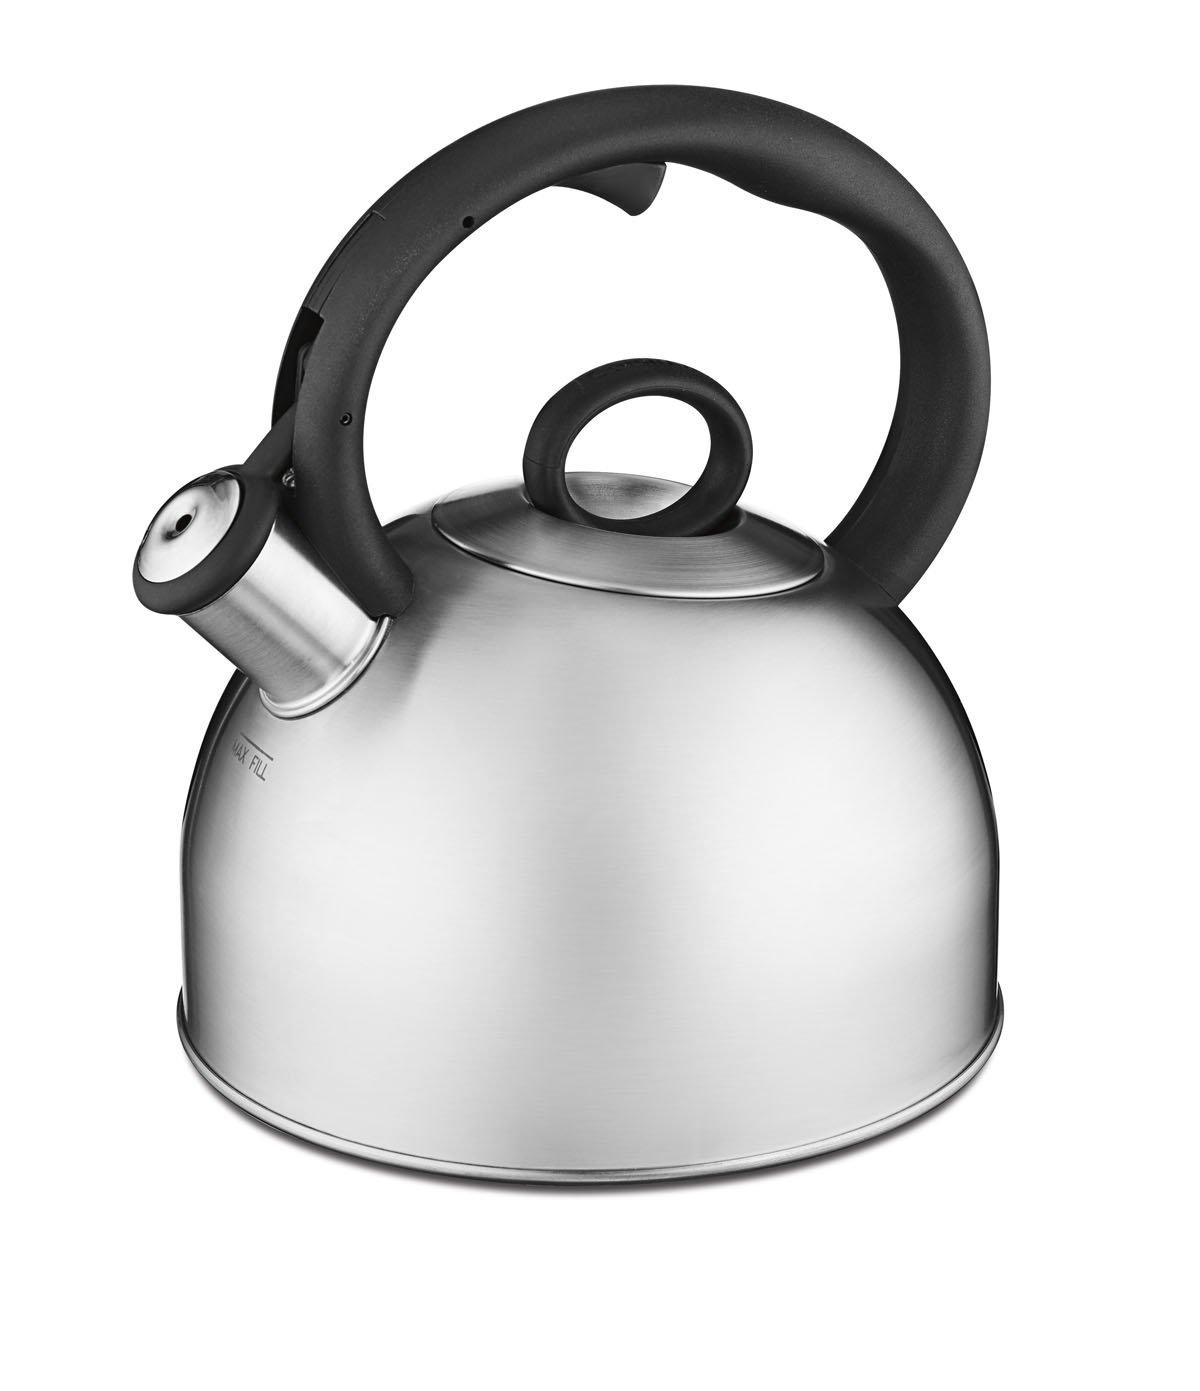 Cuisinart CTK-SS17 Aura Stainless Steel Stovetop Teakettle, 2QT. by Cuisinart